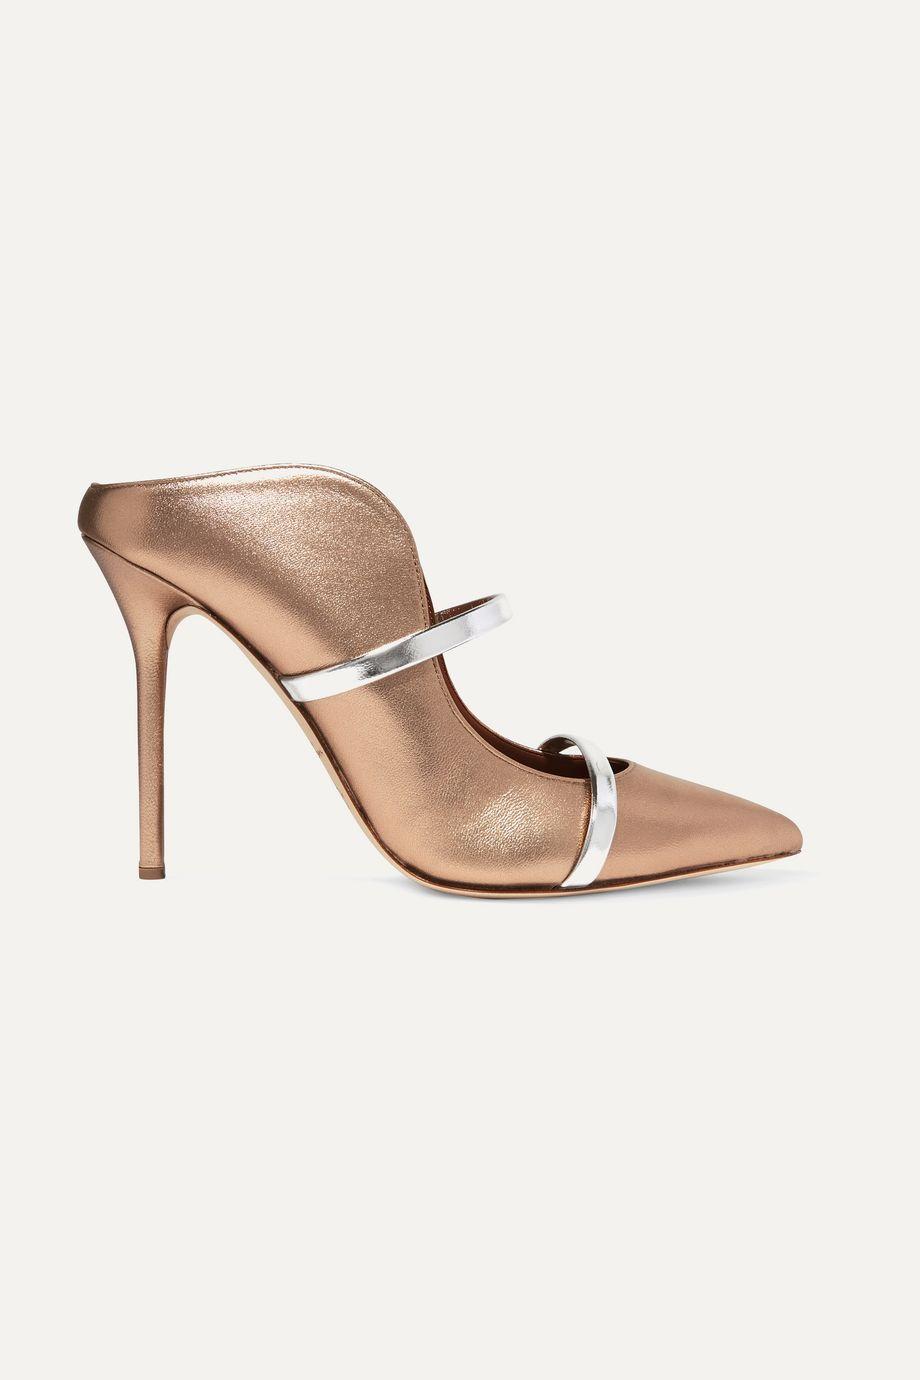 Malone Souliers Maureen 100 金属感皮革穆勒鞋